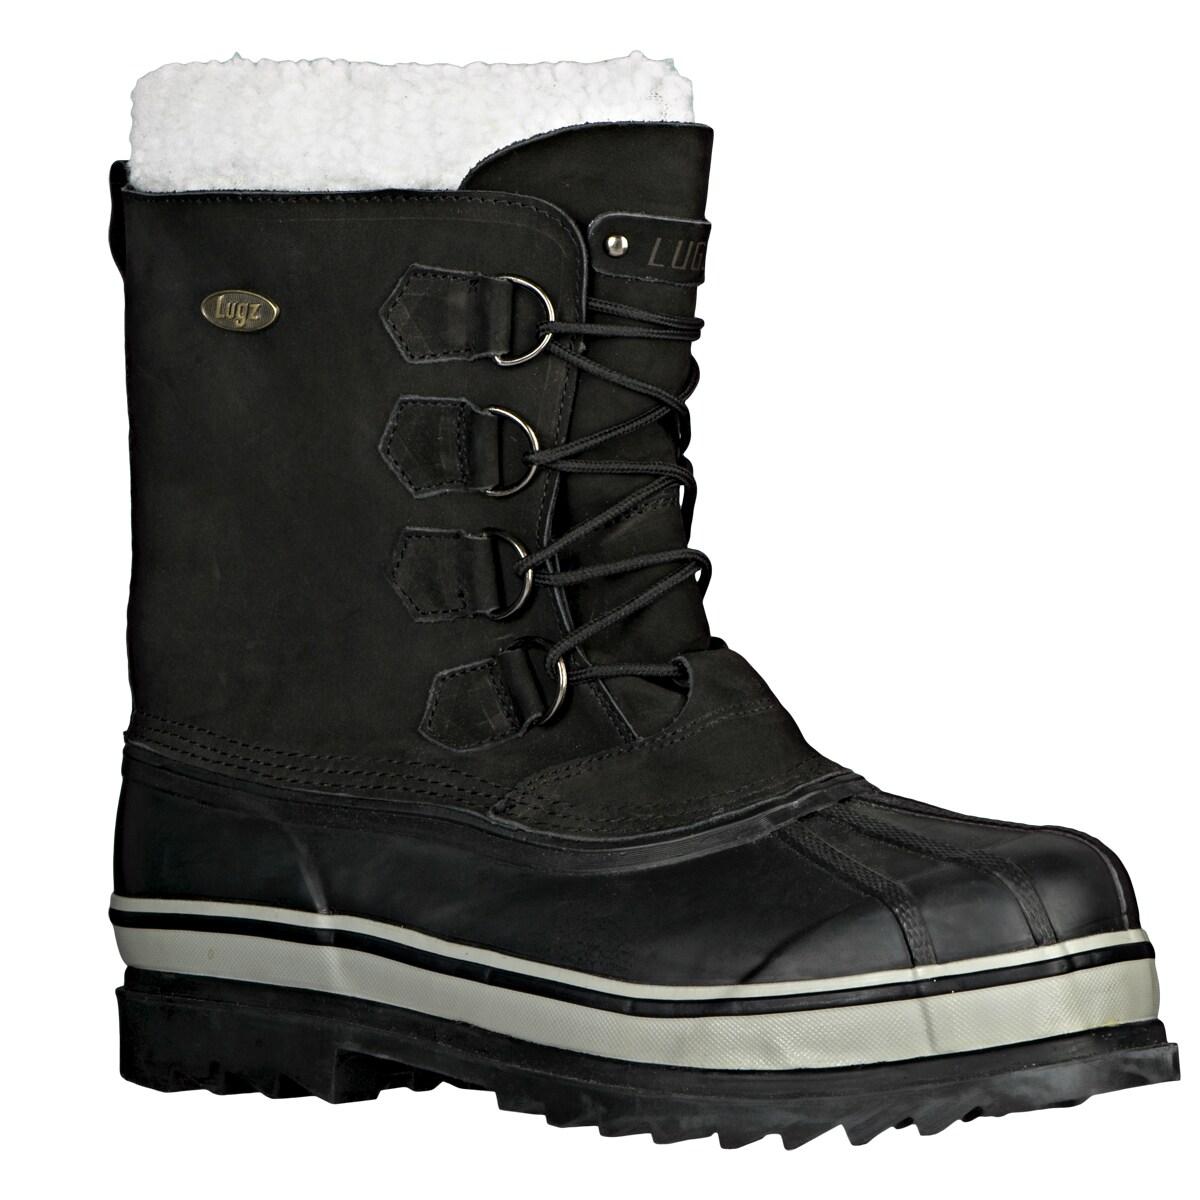 Lugz Men's 'Geyser' Black Nubuck Boots